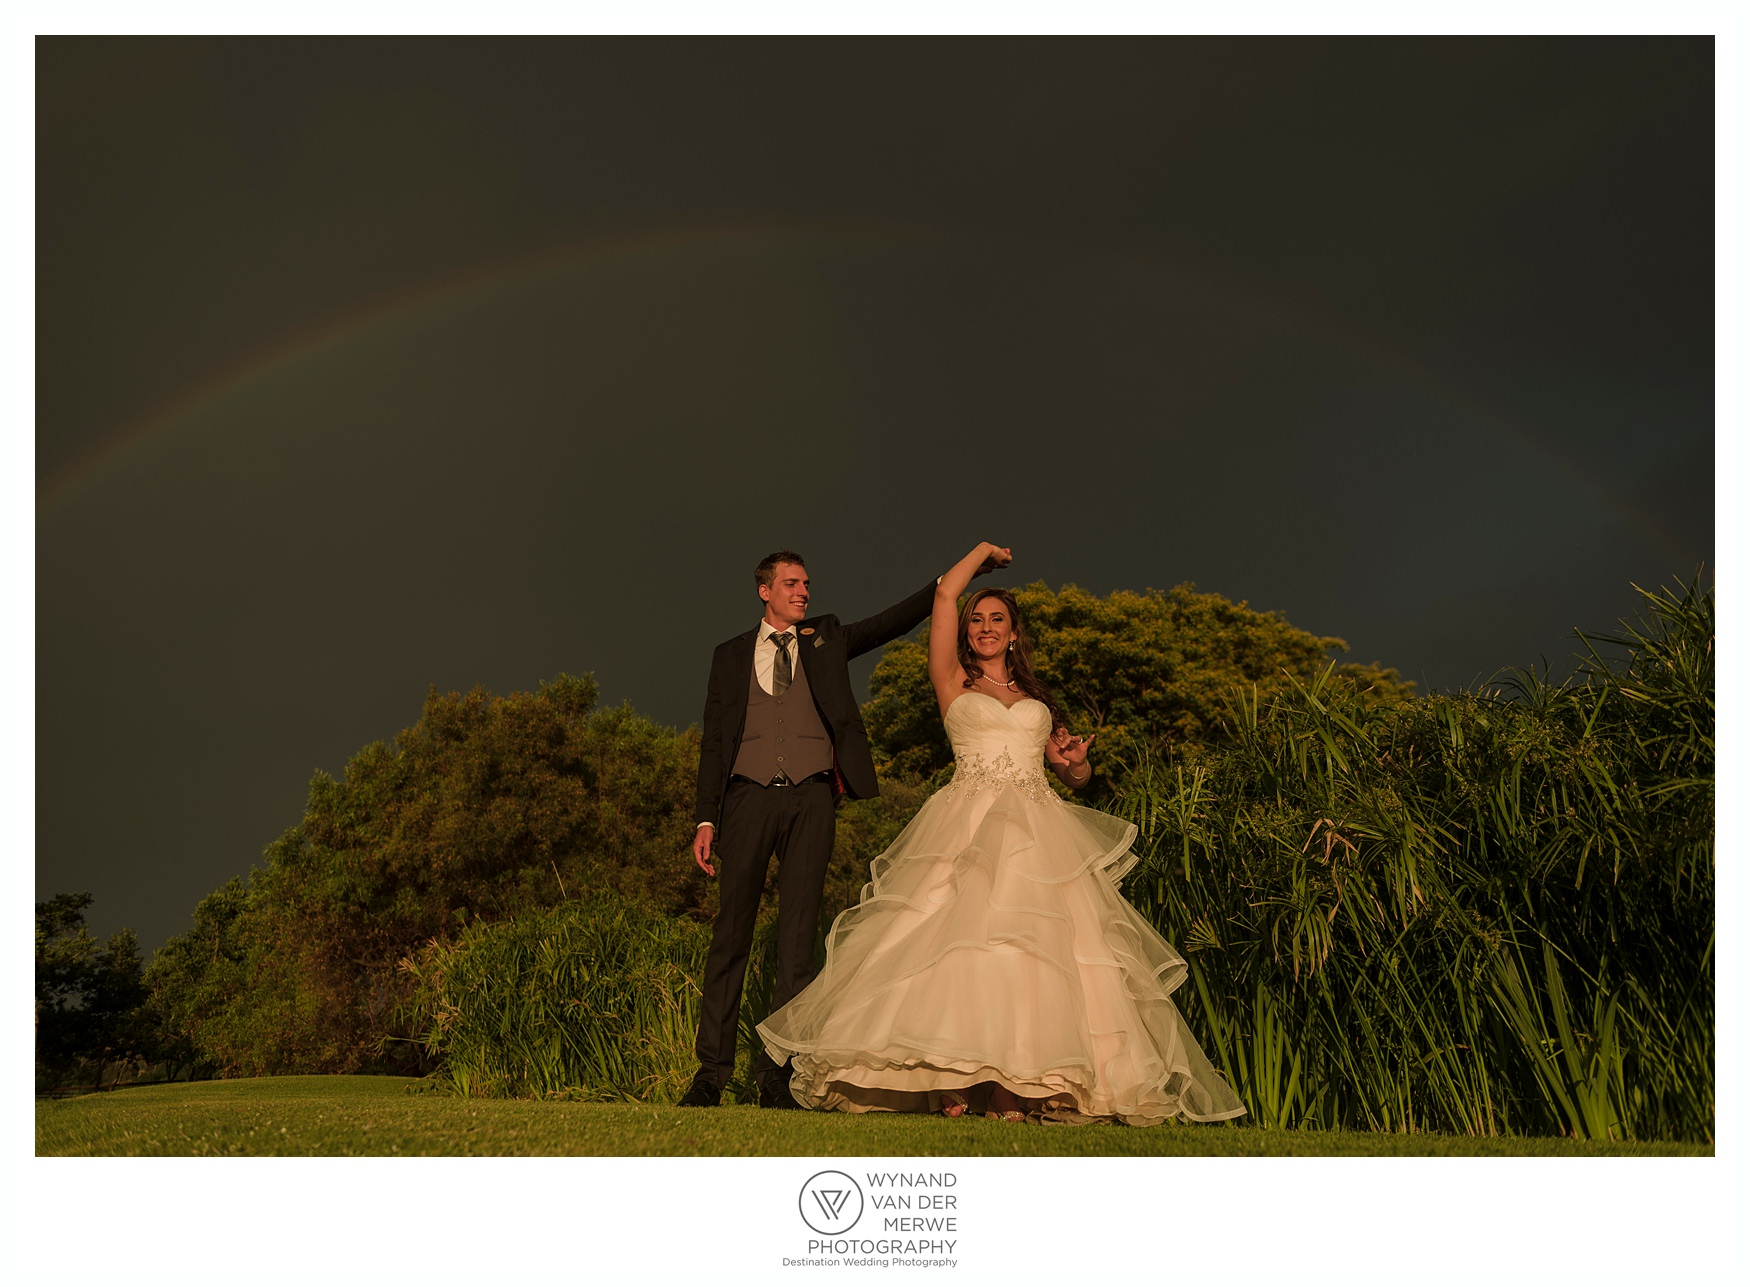 Wynandvandermerwe ryan natalia wedding photography cradle valley guesthouse gauteng-26.jpg